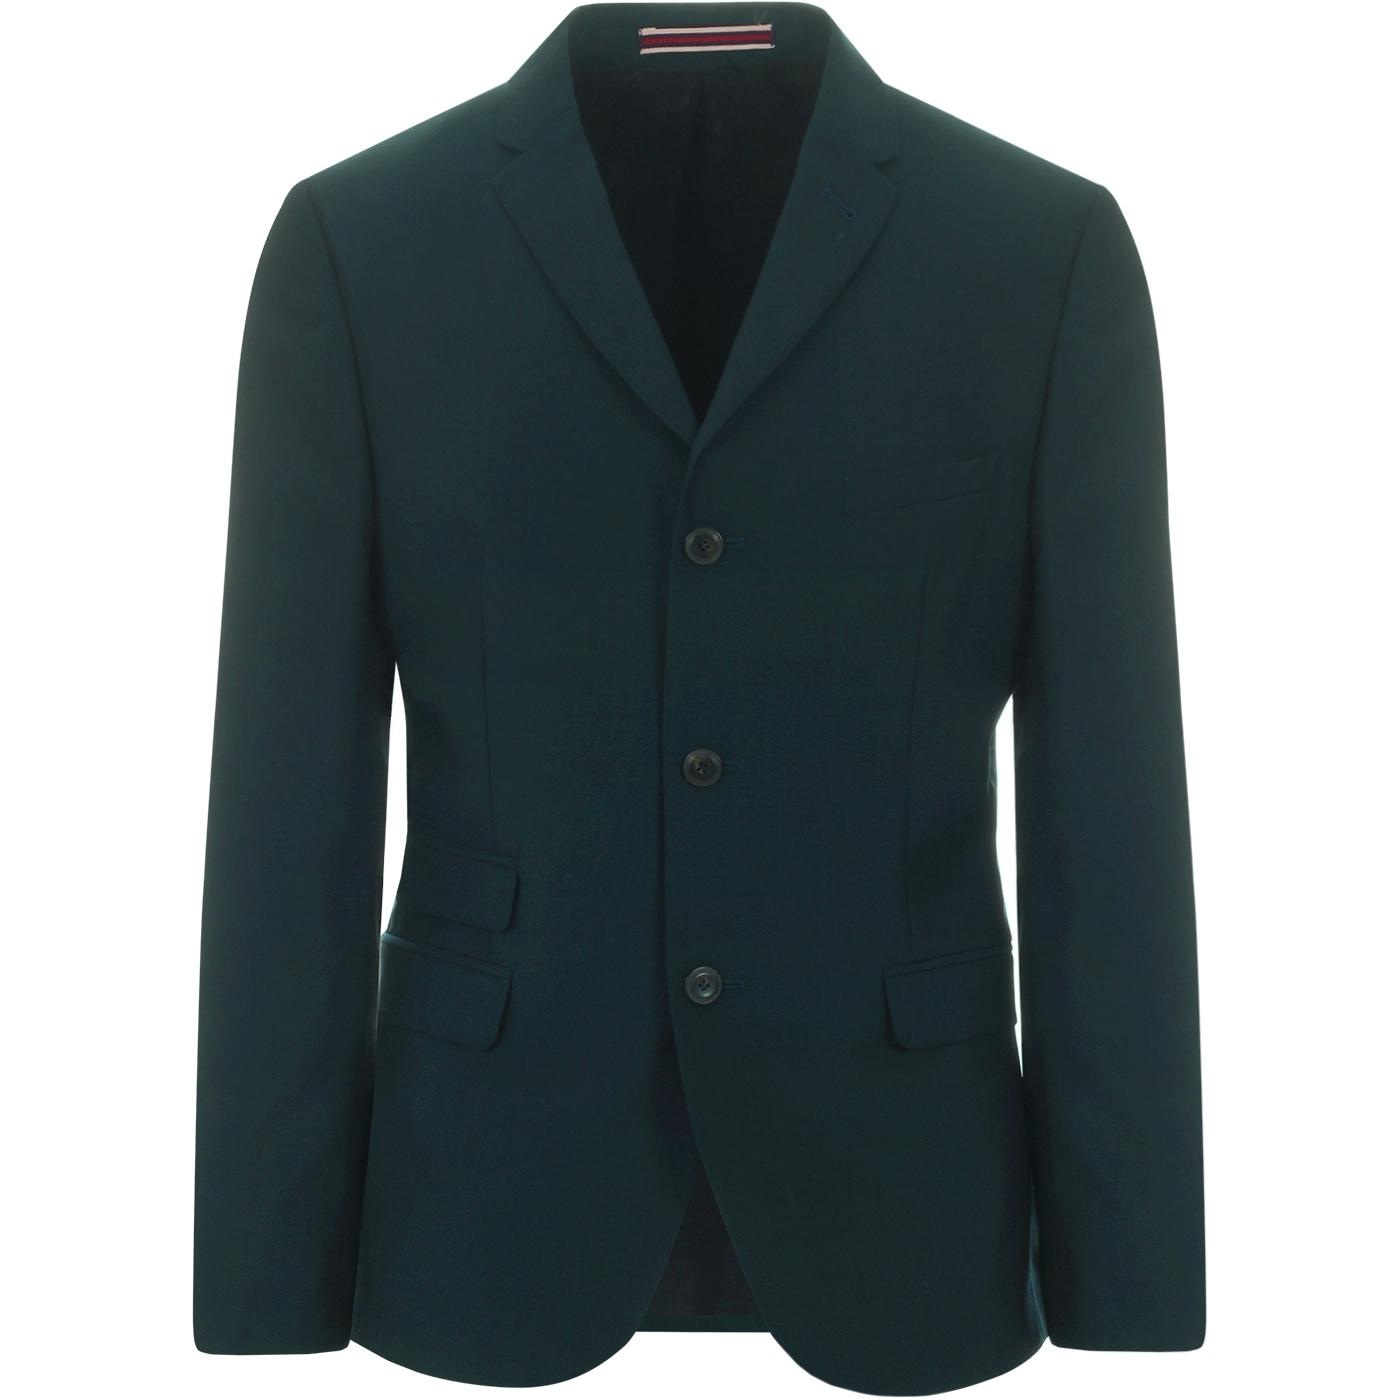 BEN SHERMAN 3 Button Tonic Suit Jacket (Sea Moss)